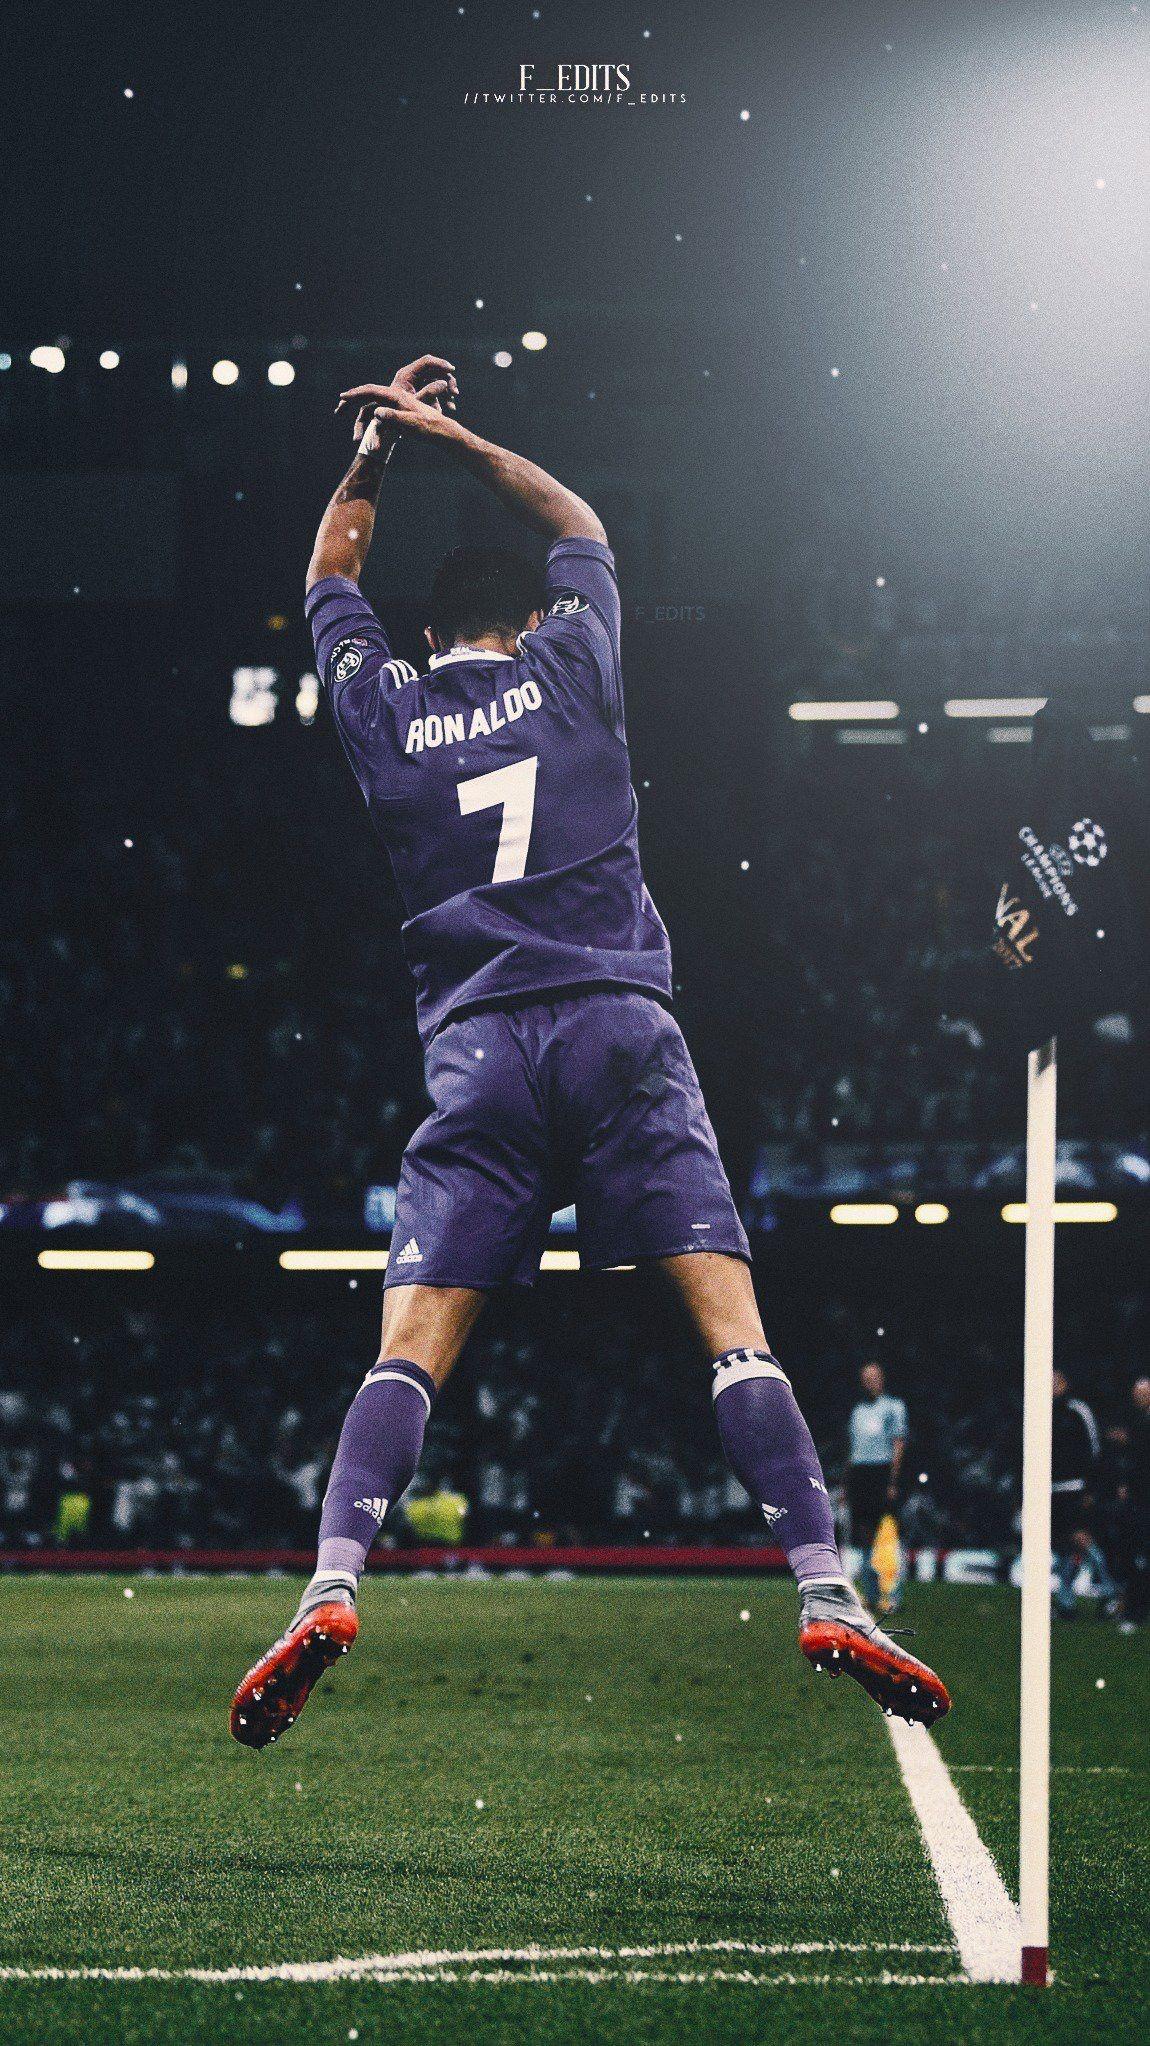 Ronaldo Real Madrid Seleccion Española De Futbol Jugador De Futbol Ronaldo Siii